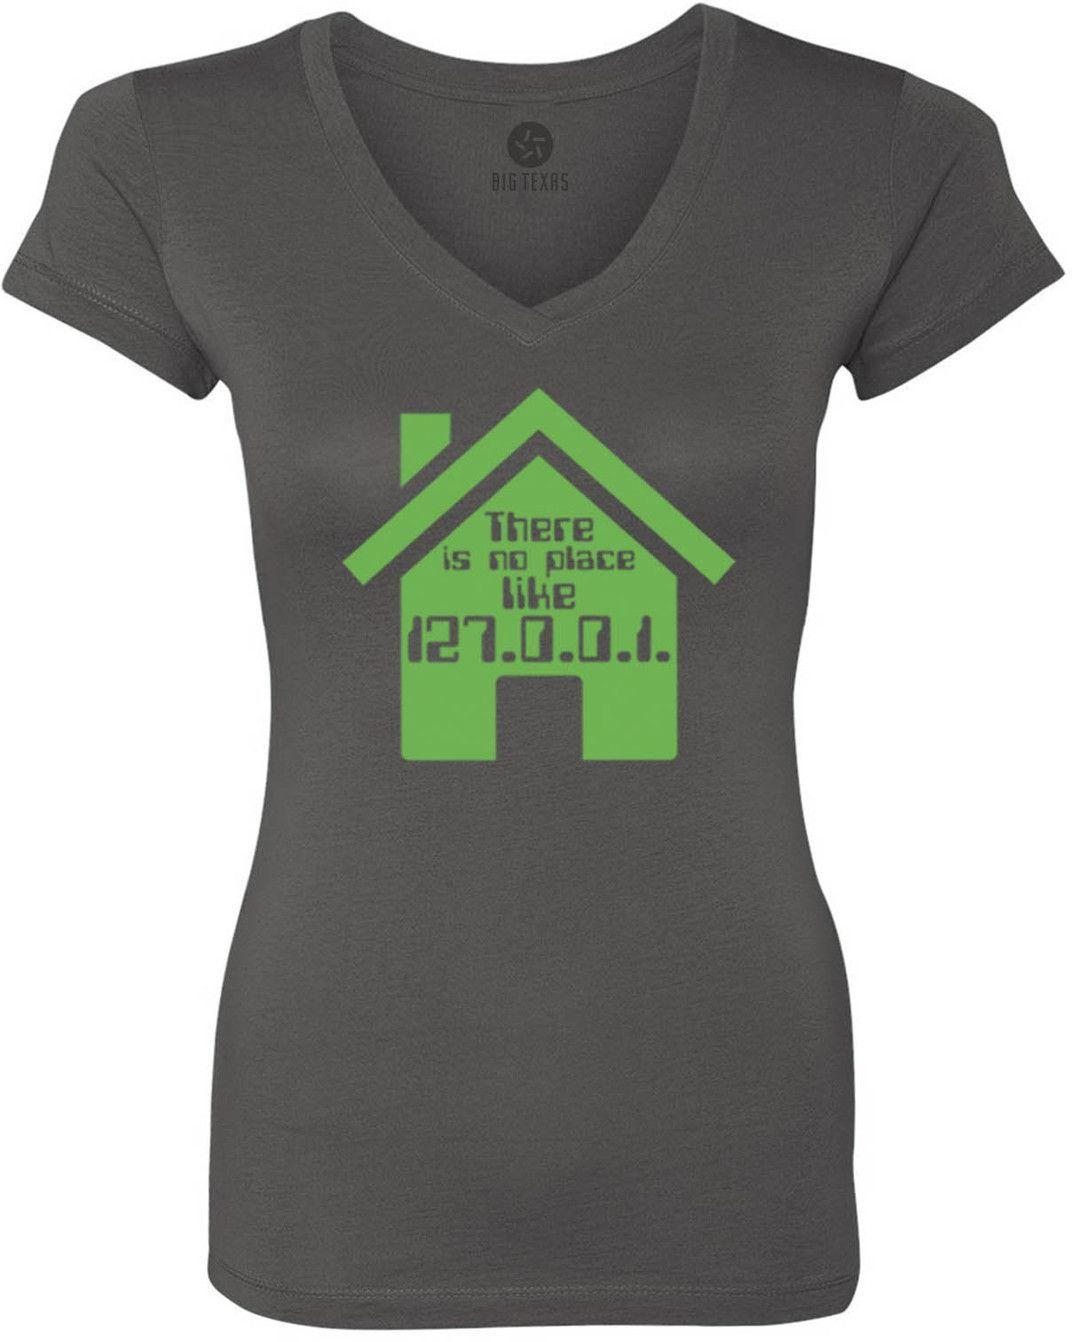 No Place Like Home (Green) Women's Short-Sleeve V-Neck T-Shirt